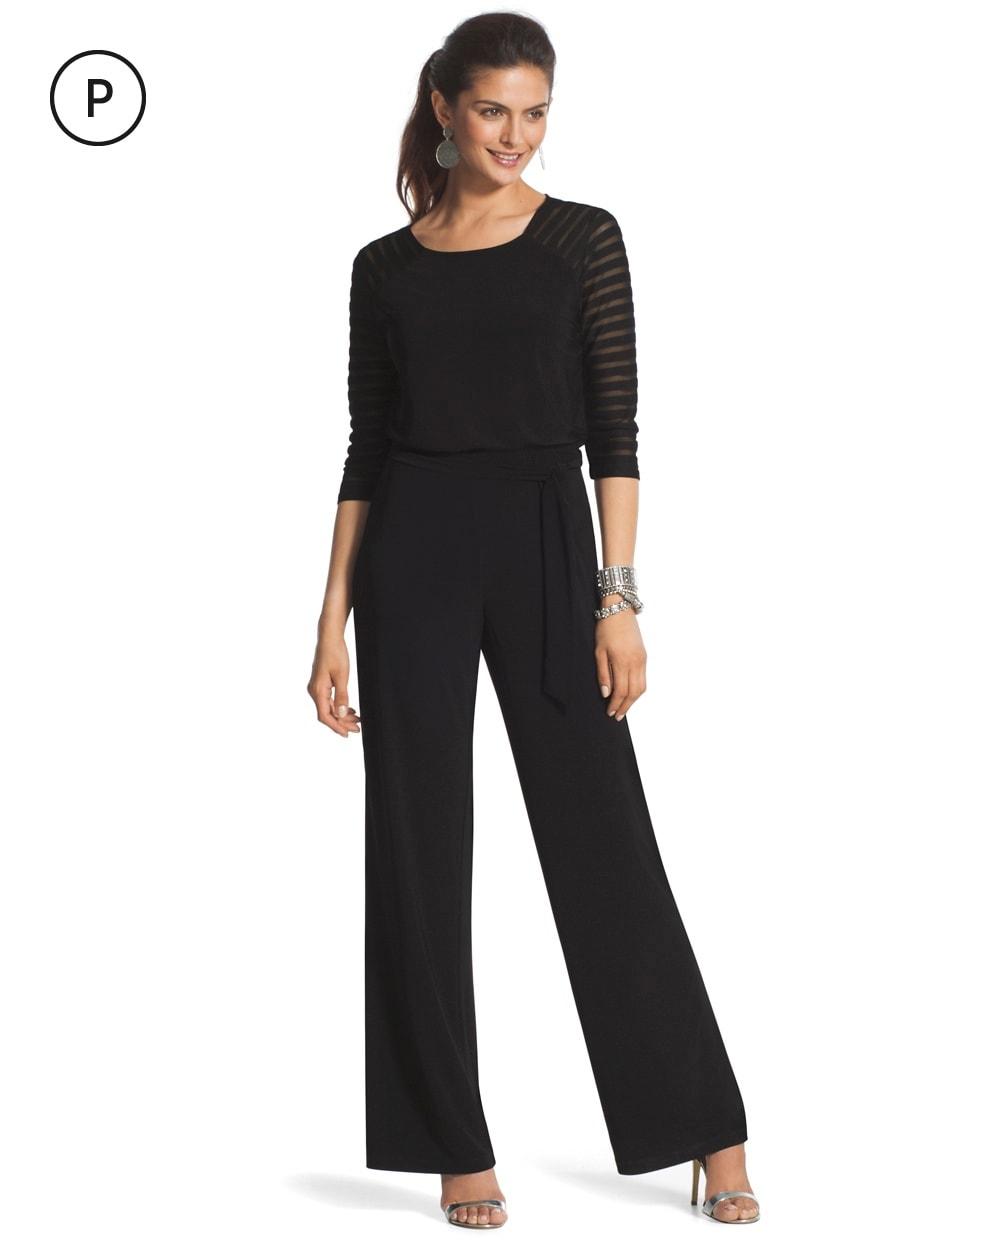 Petite Sheer Shoulder Black Jumpsuit - Chicos